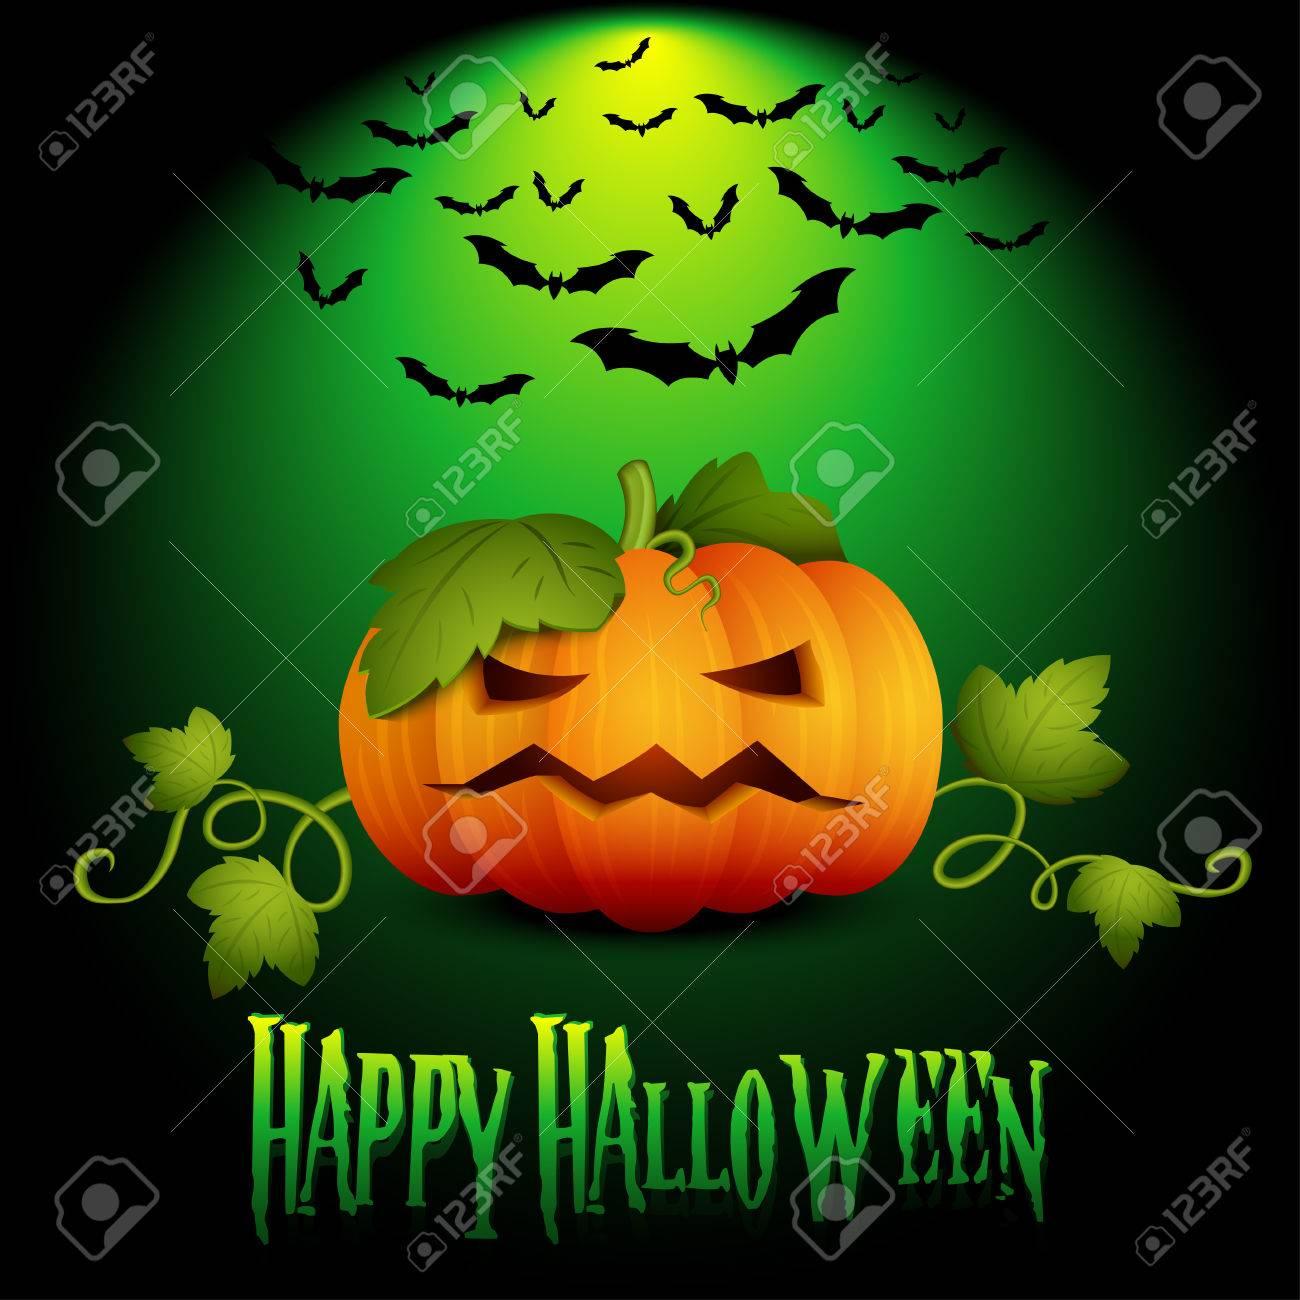 Excepcional Arte De Uñas De Halloween Murciélago Colección de ...